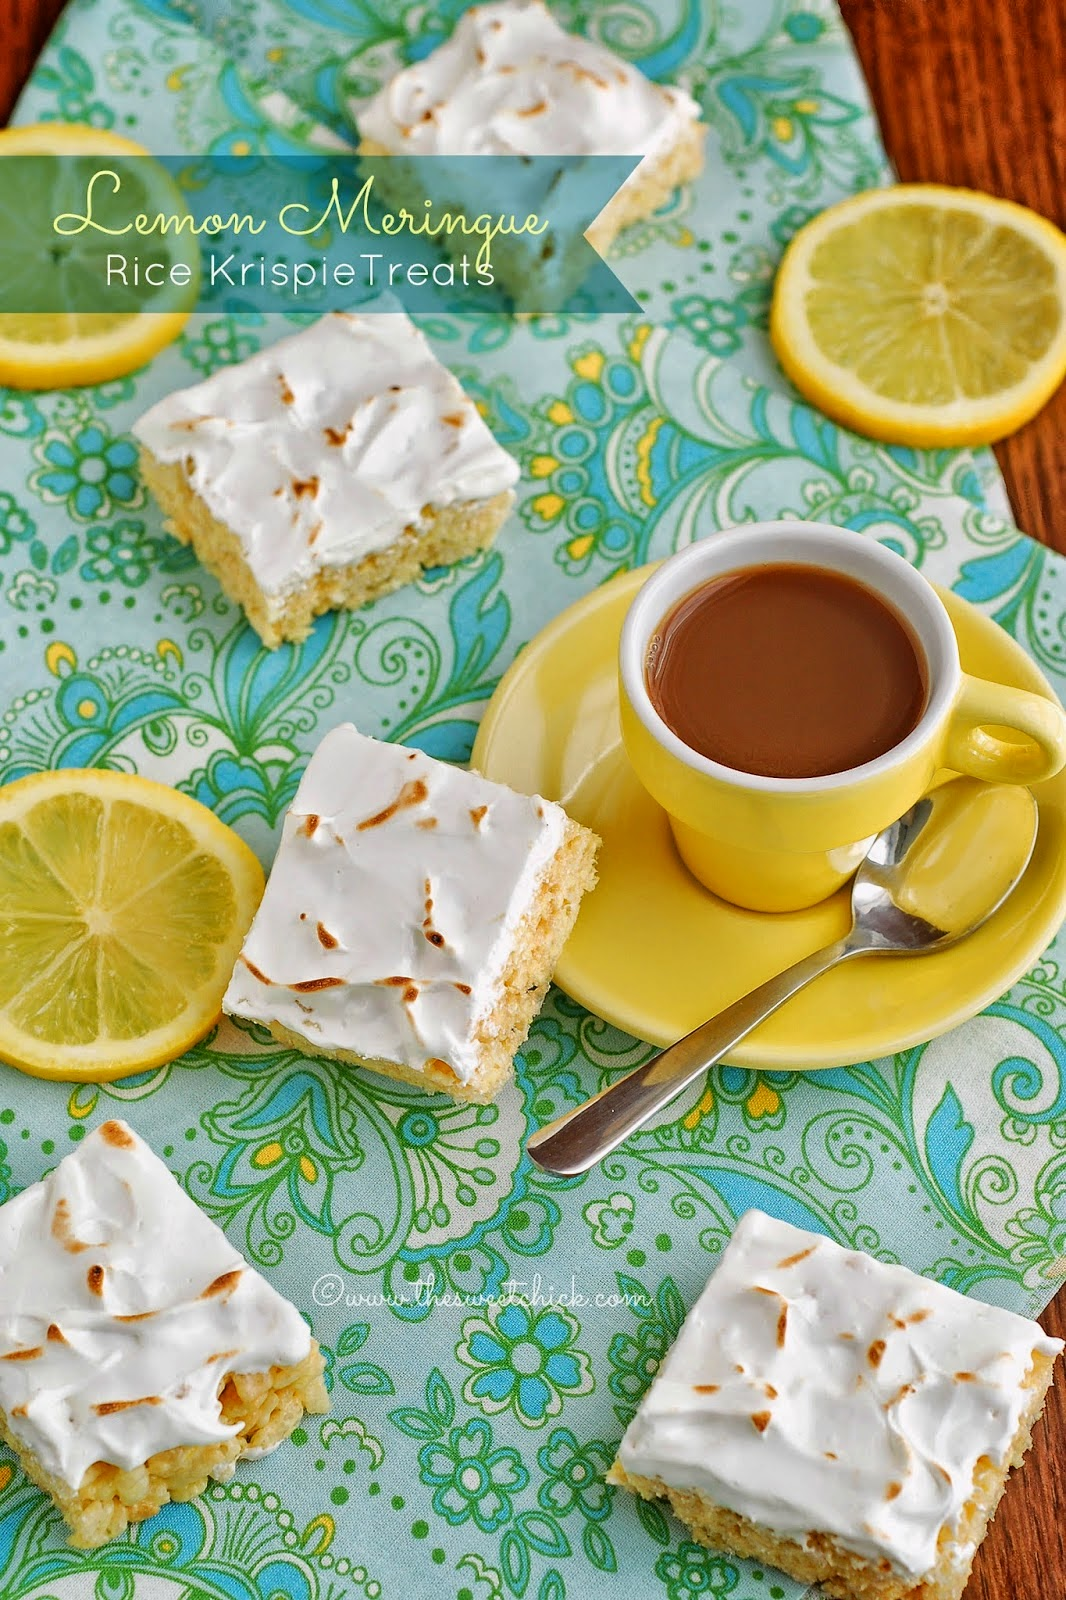 Lemon Meringue Rice Krispie Treats by The Sweet Chick